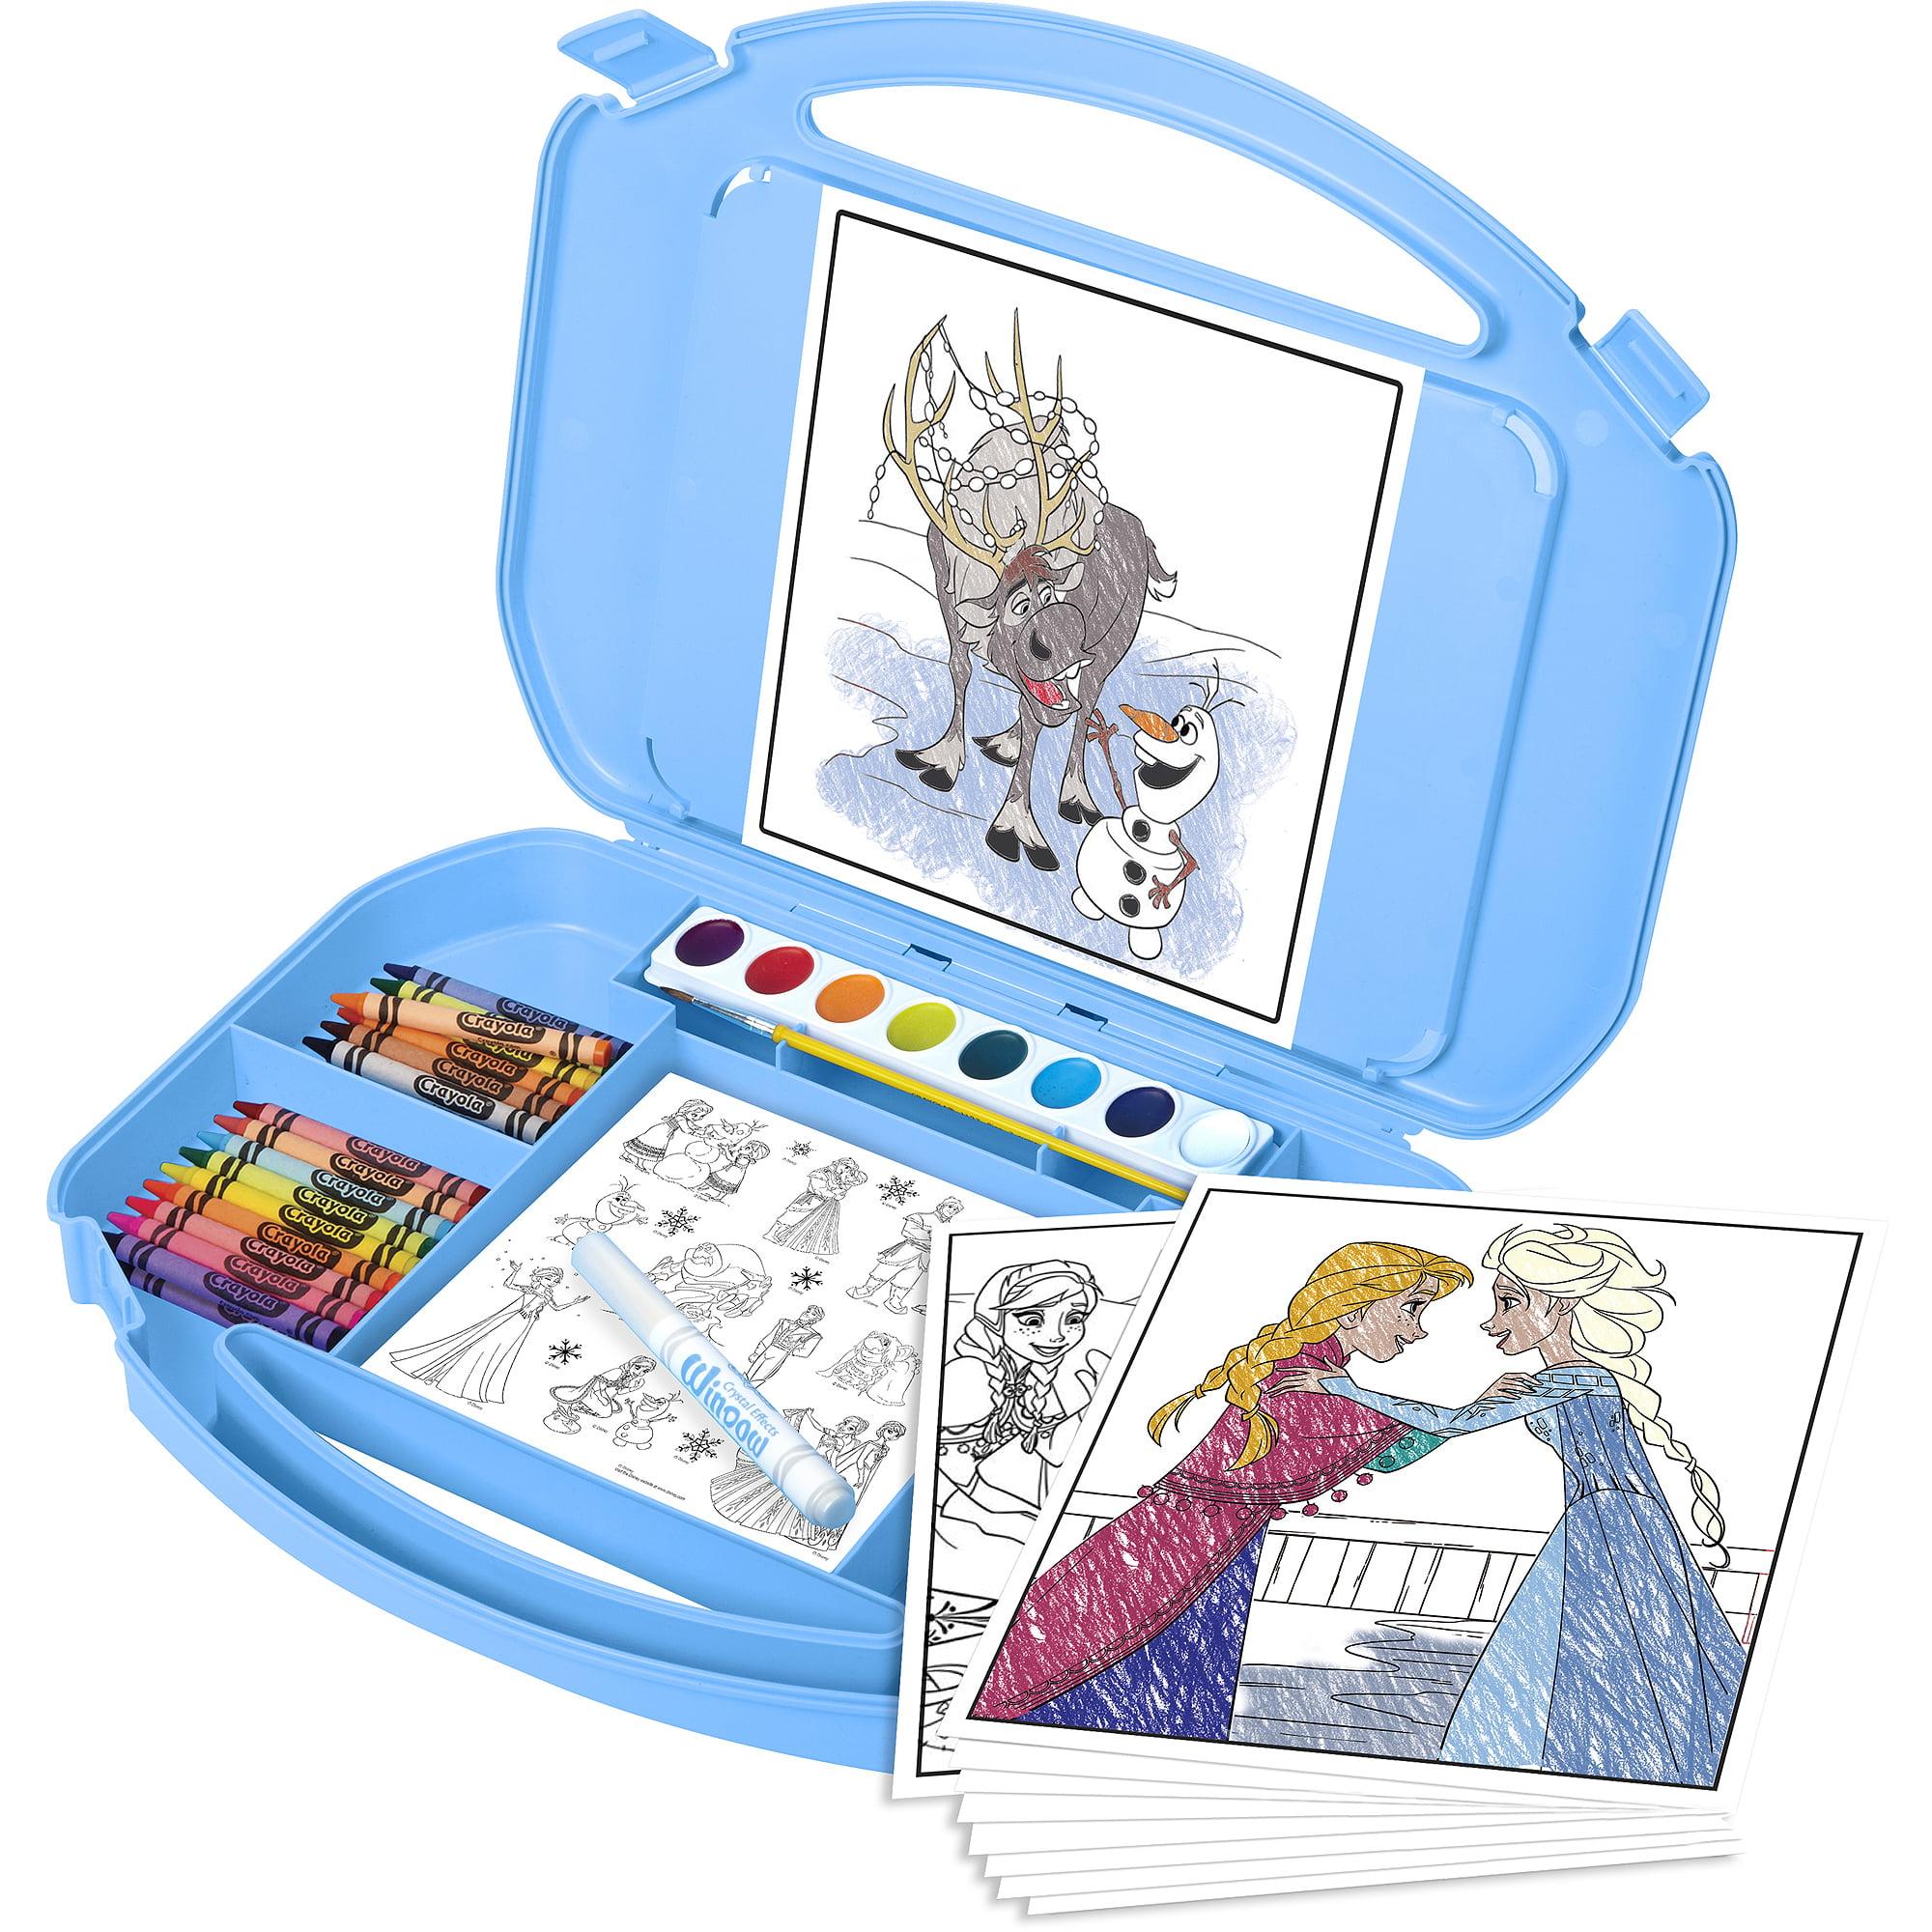 Disney Frozen Ultimate Art Kit